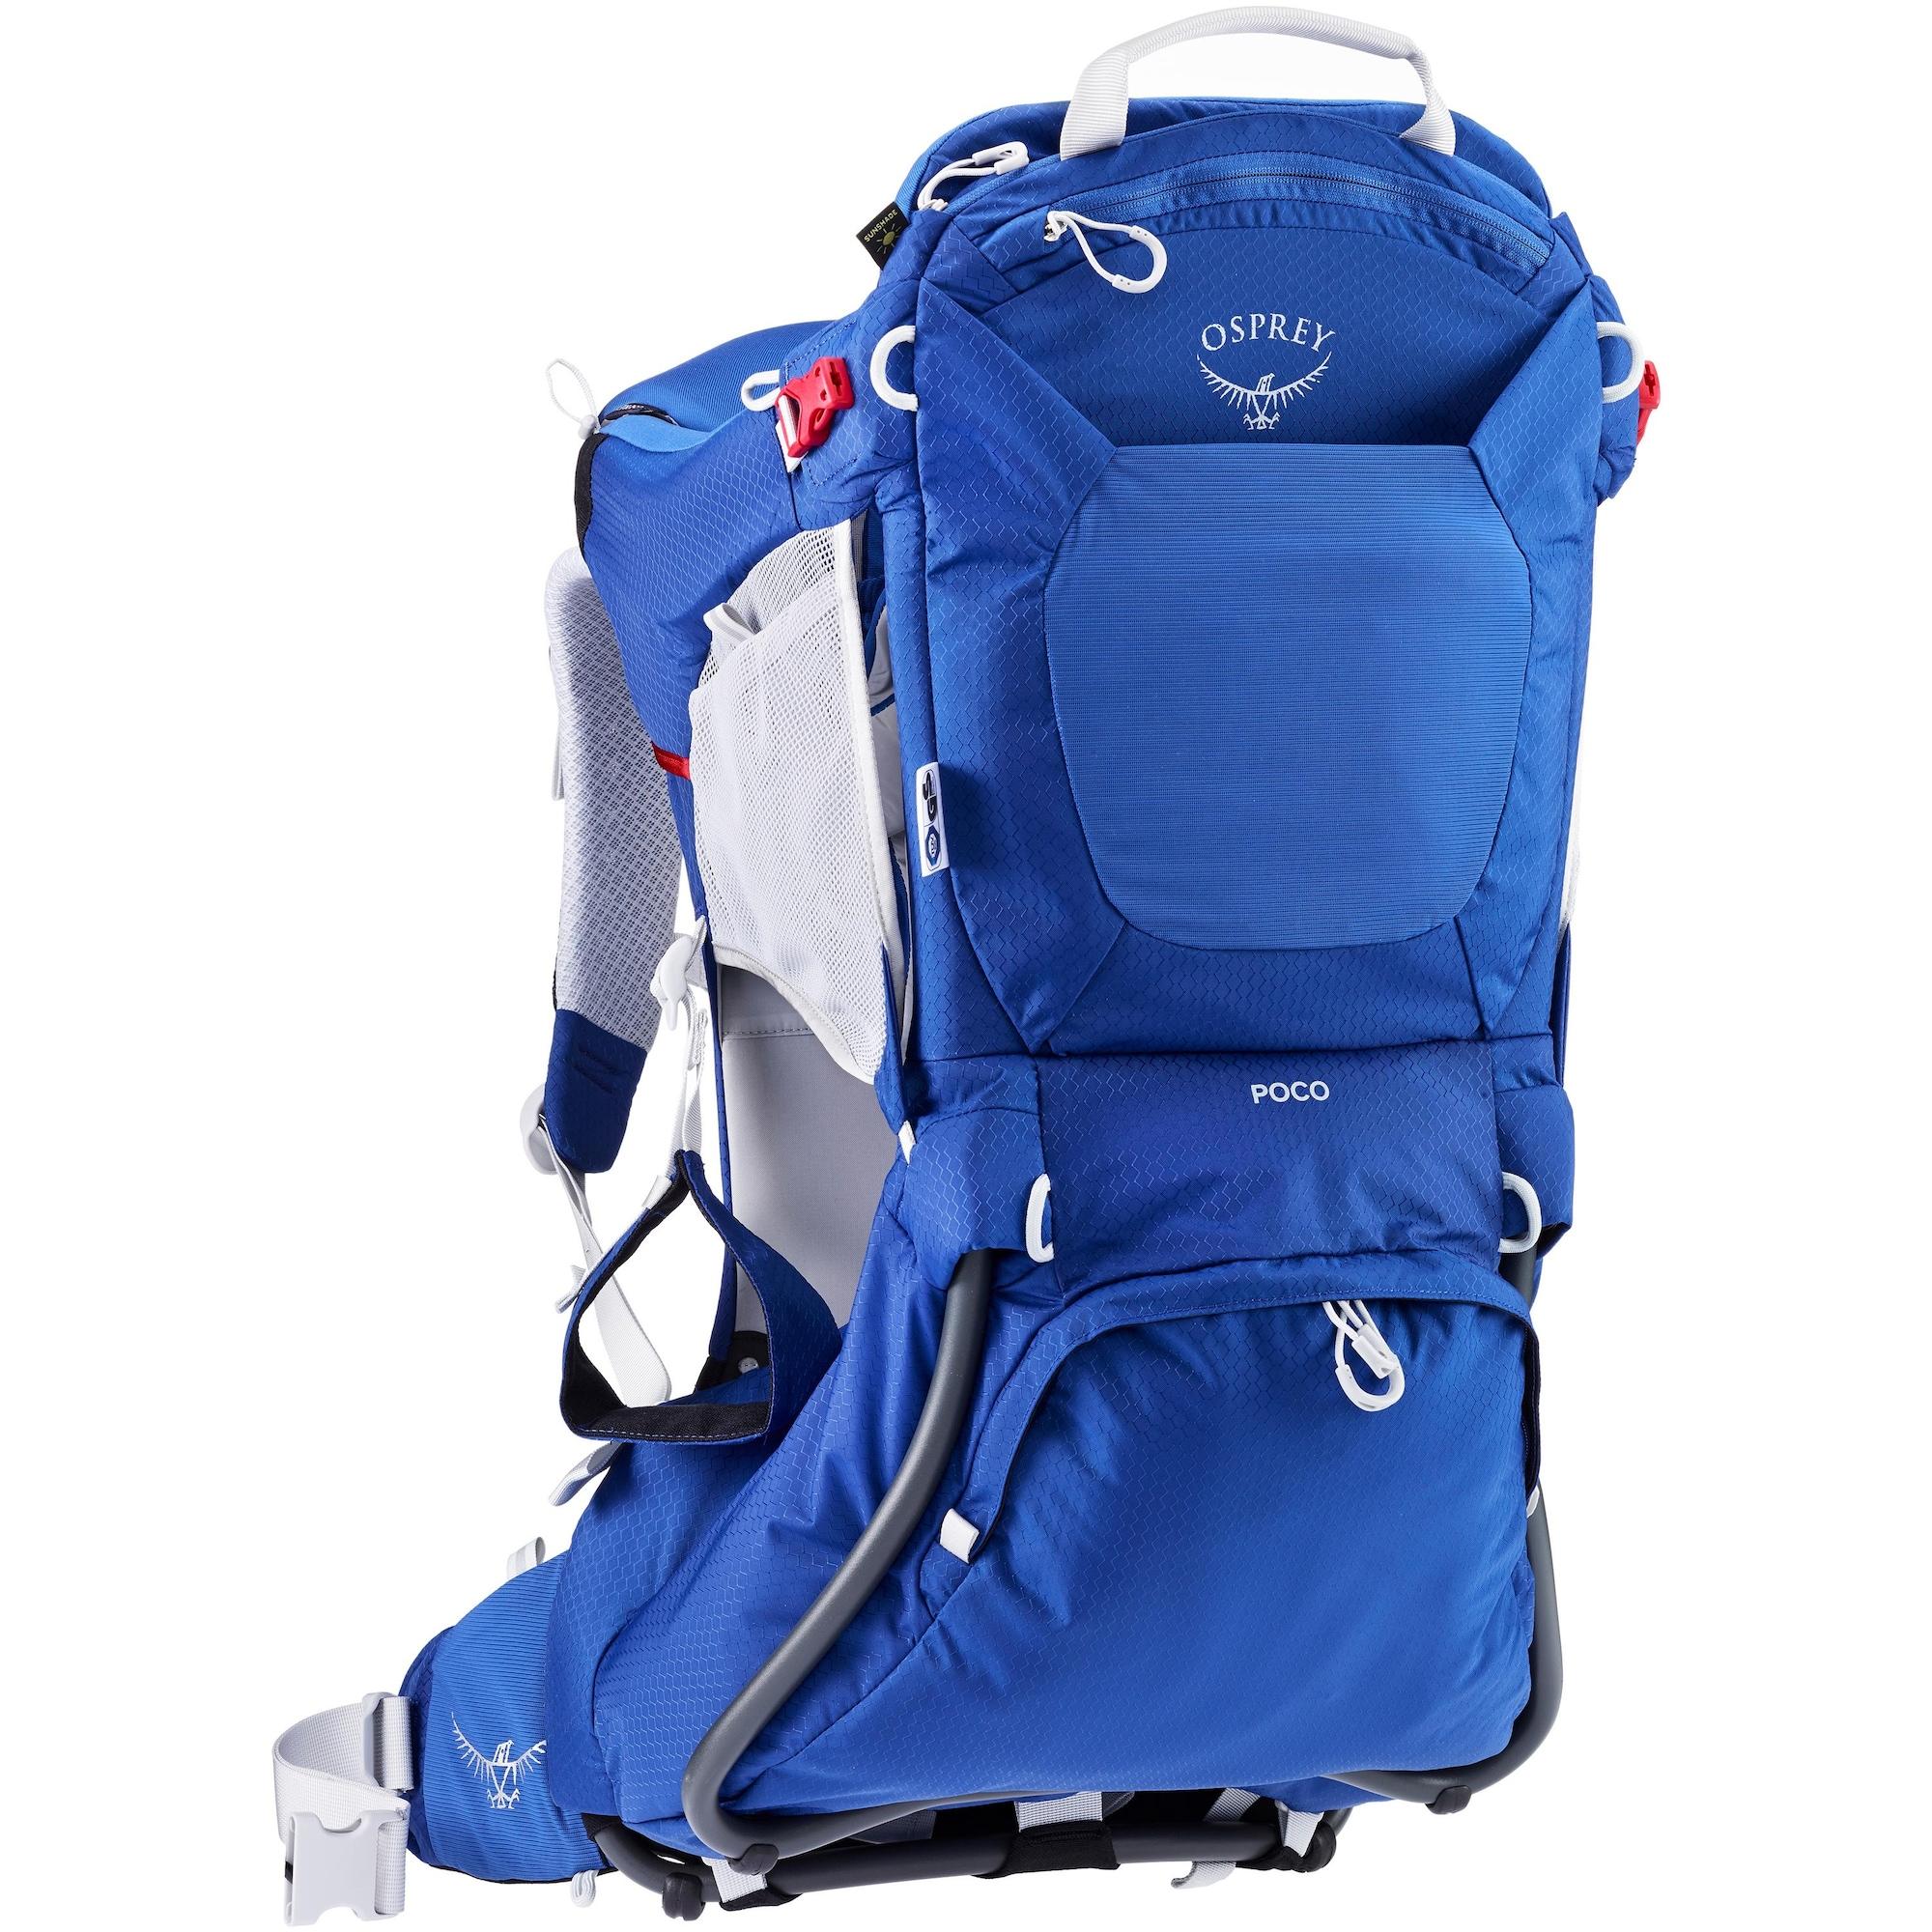 Kraxe 'Poco blau' | Taschen > Rucksäcke > Tagesrucksäcke | Osprey